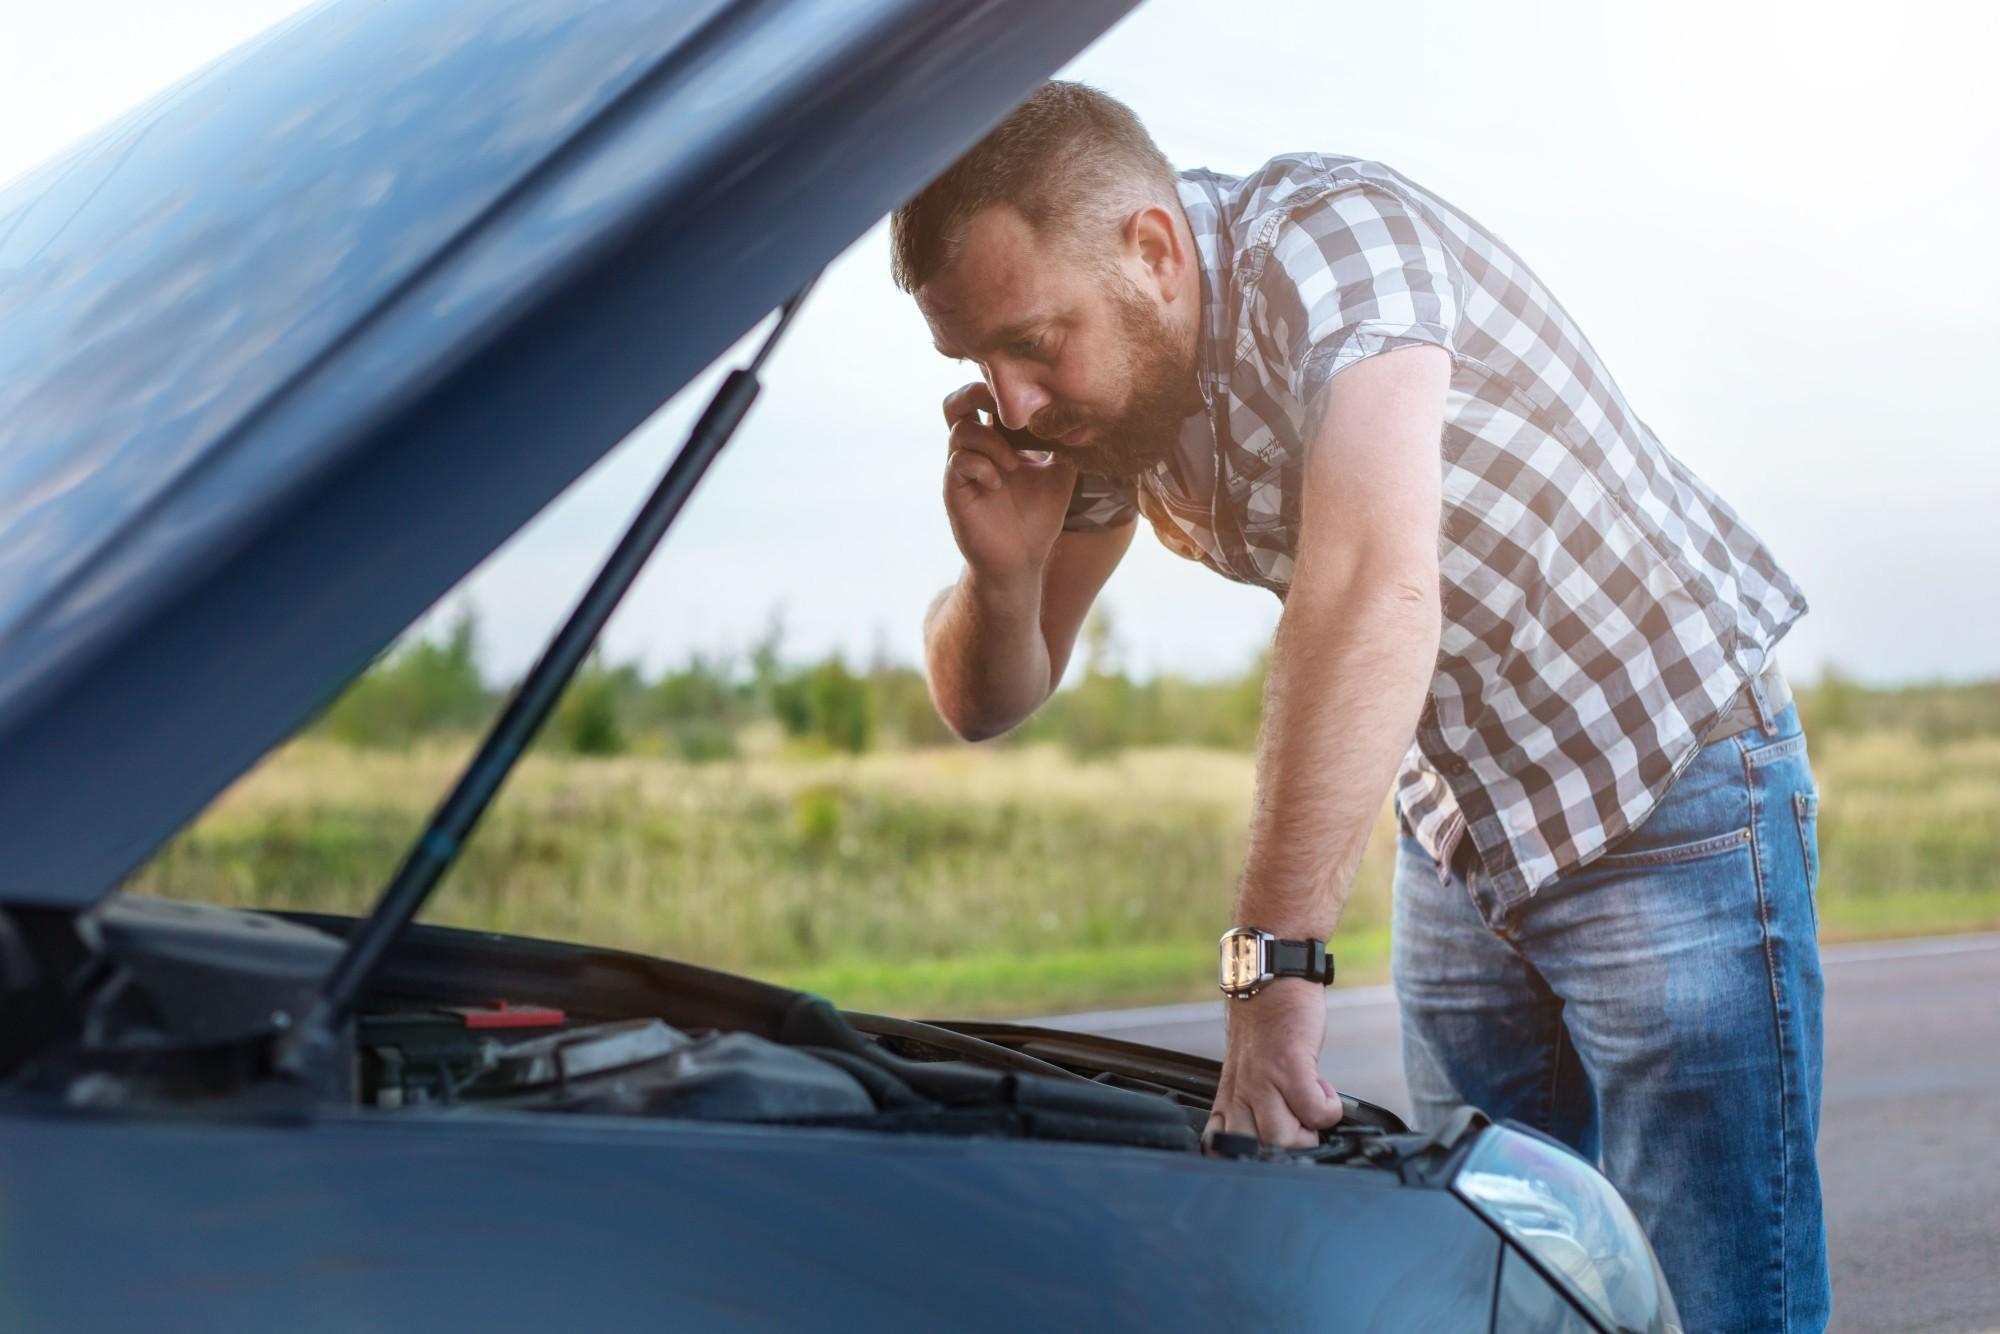 What Items Should Be in A Roadside Emergency Kit?